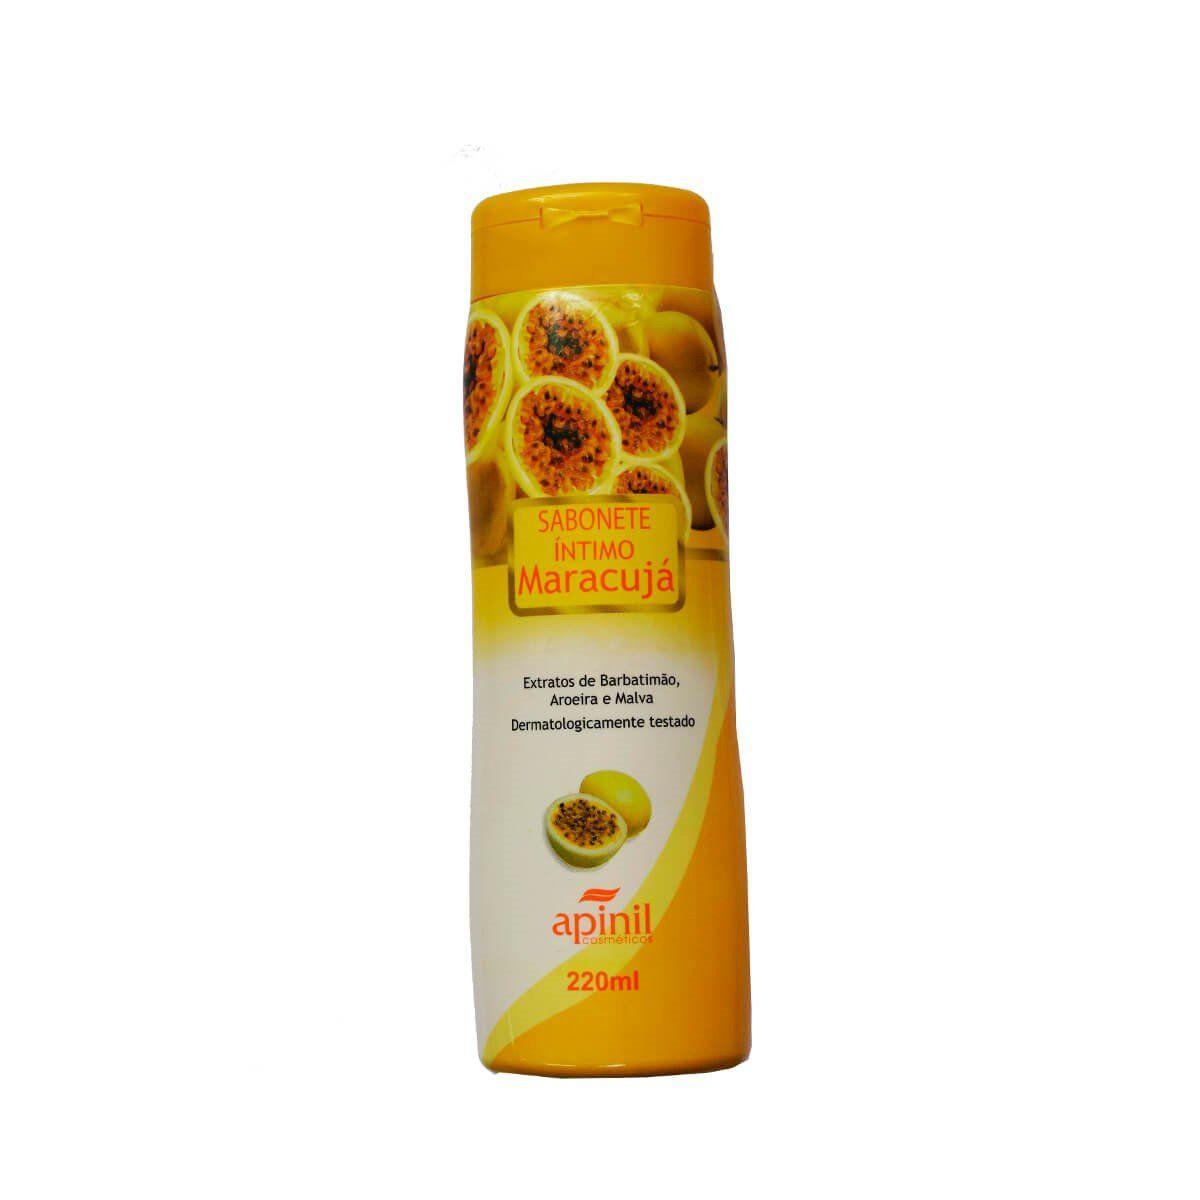 Sabonete íntimo aroma de maracujá 220ml